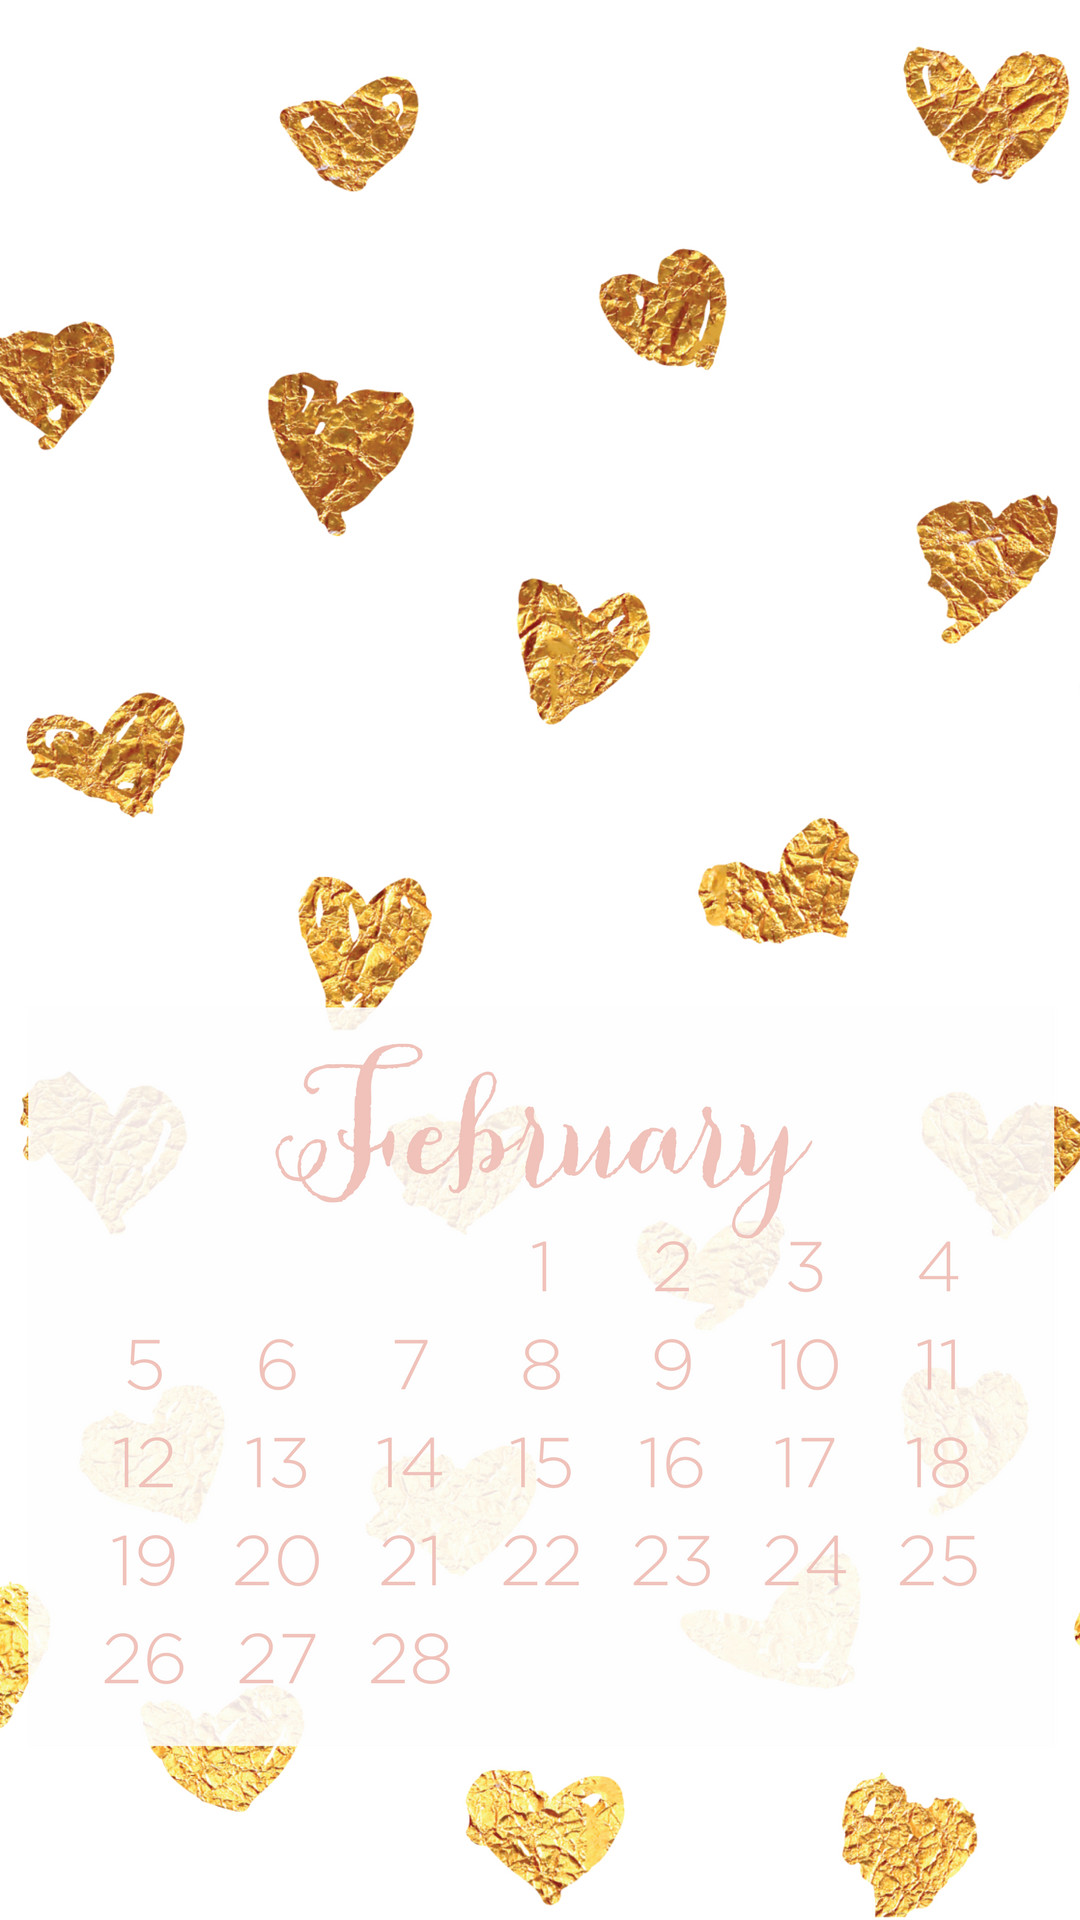 Click to download the foil heart February calendar wallpaper.